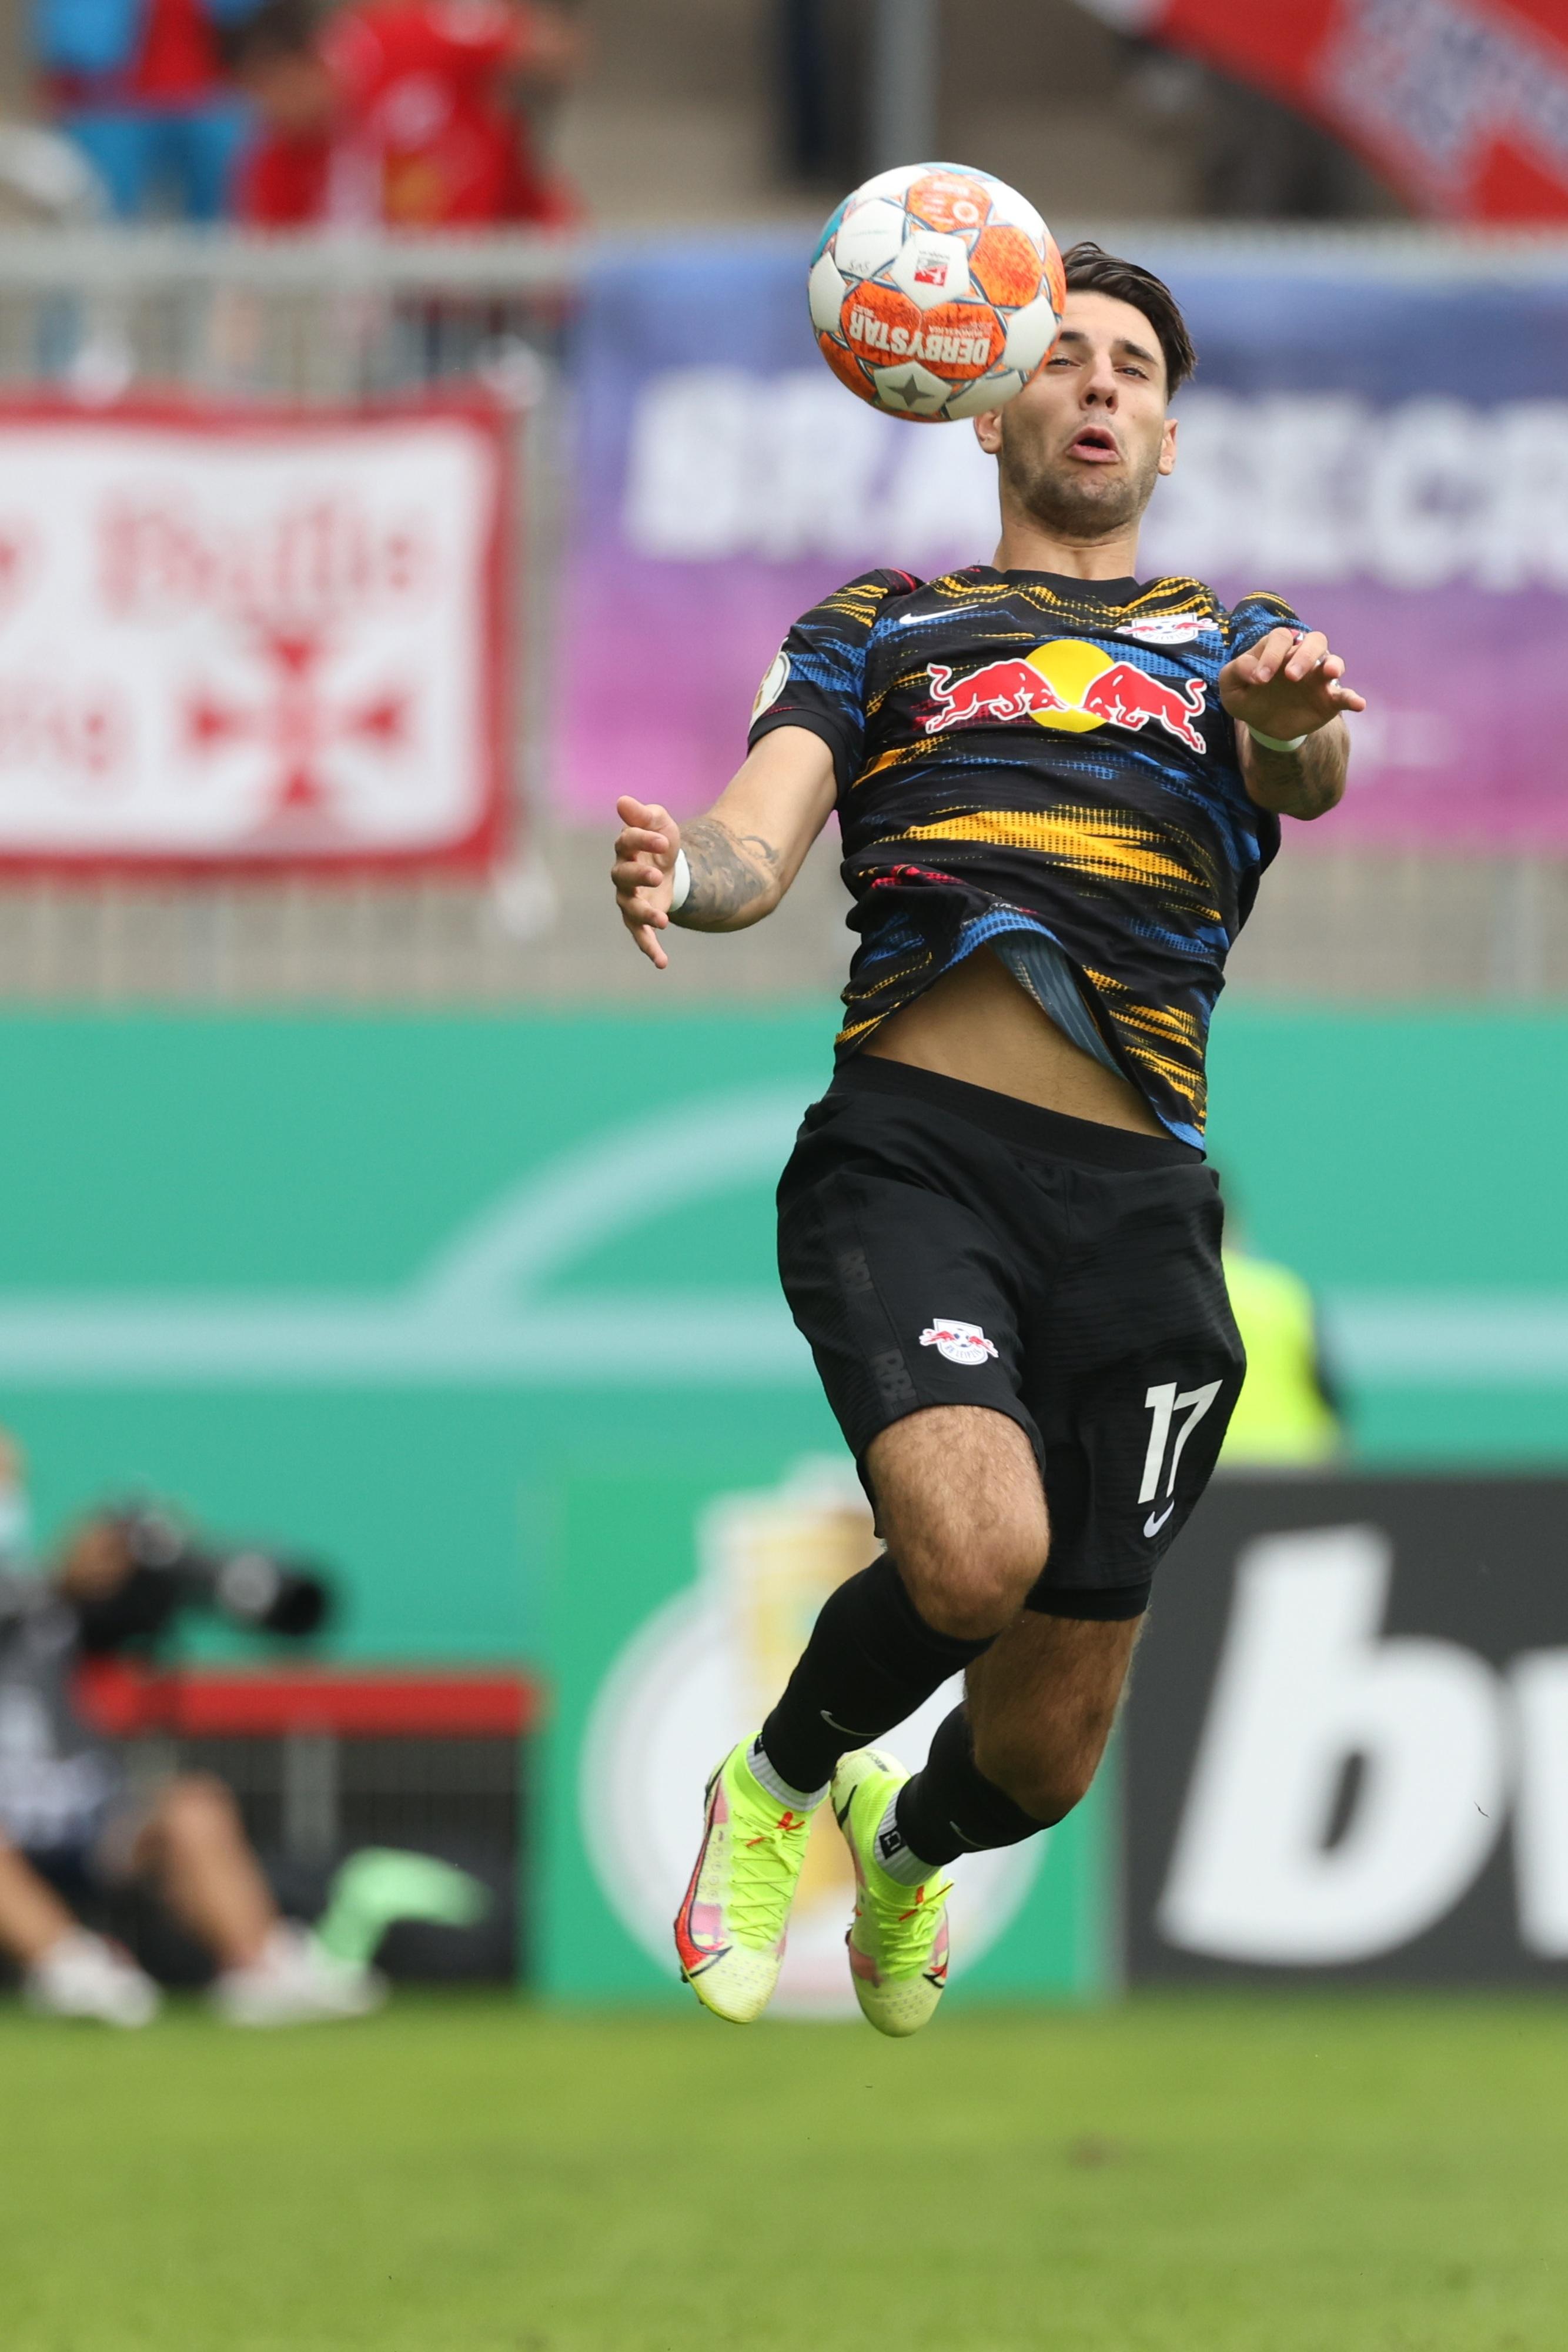 SV Sandhausen v RB Leipzig - DFB Cup: First Round